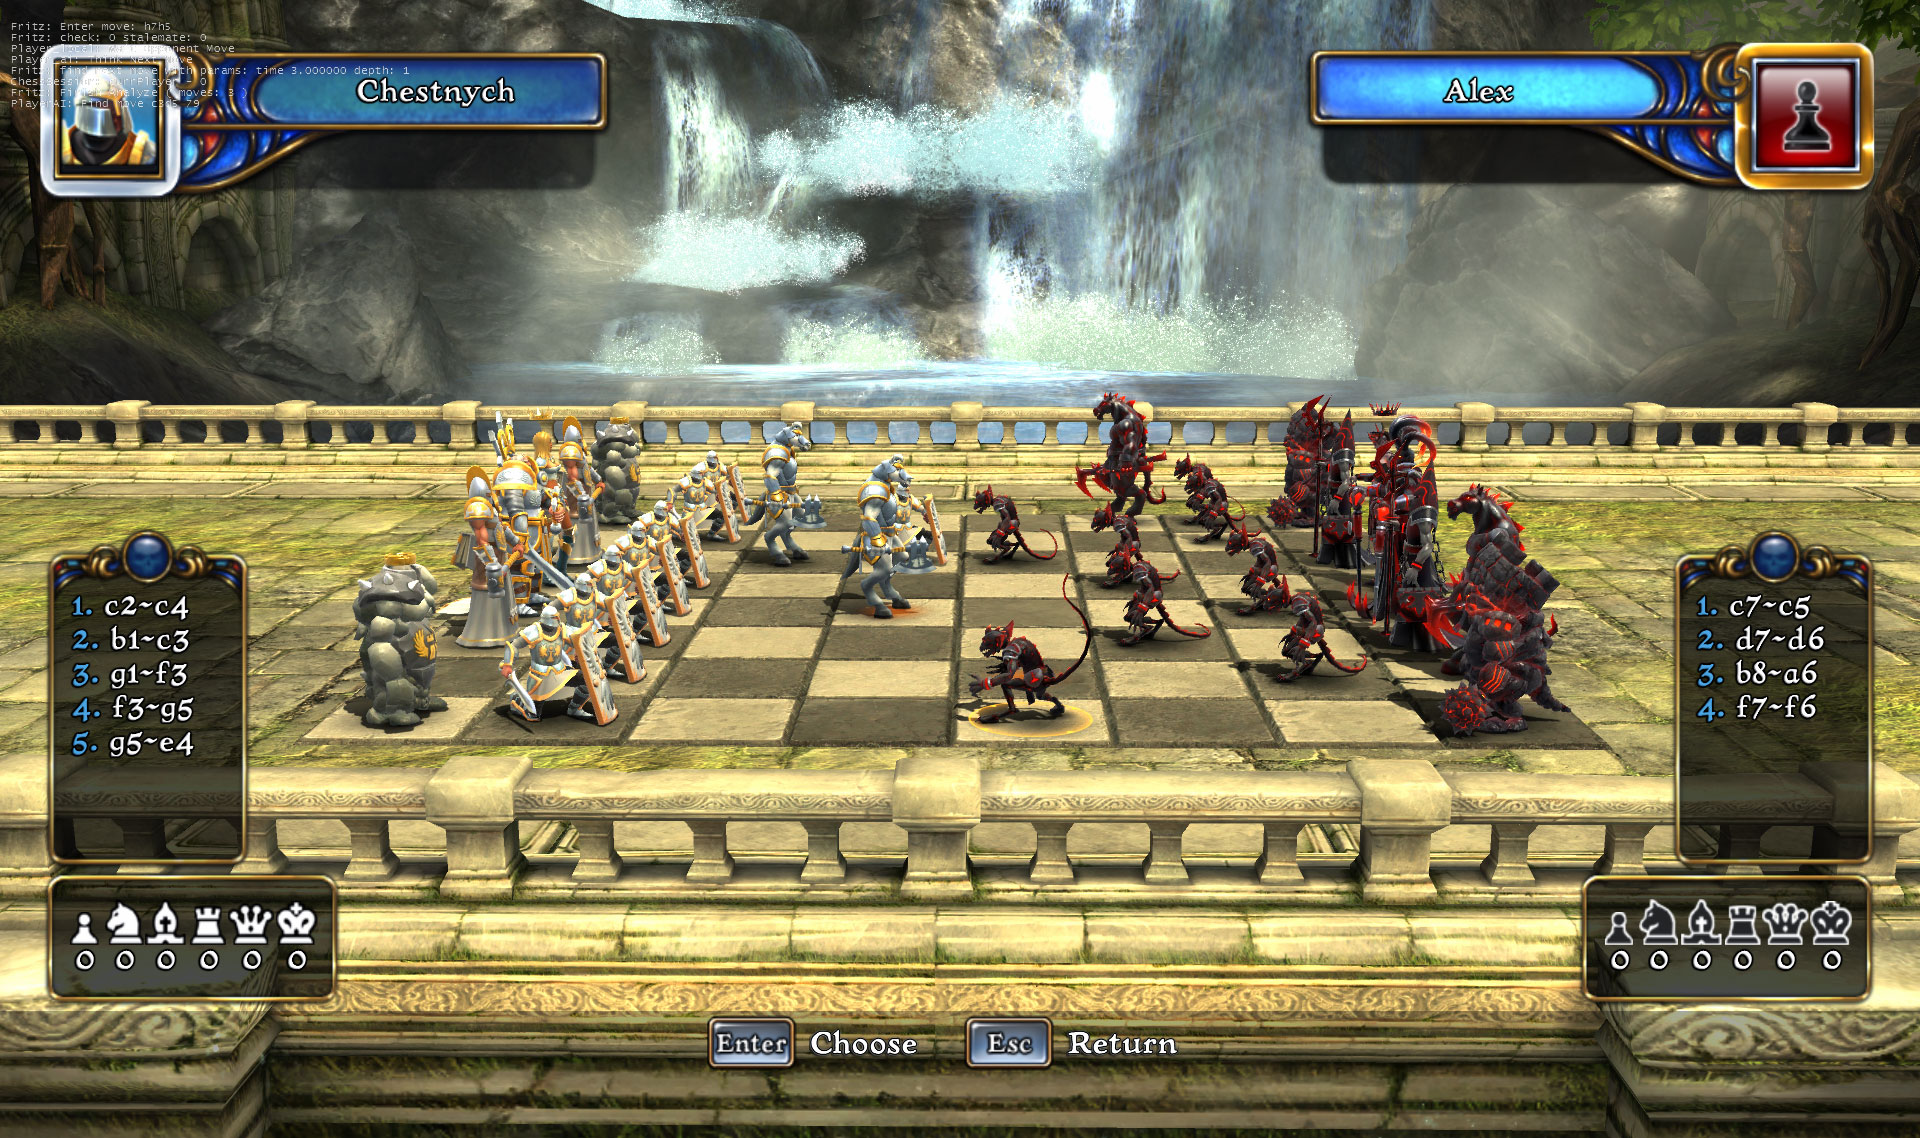 Battle vs chess screenshots video game news videos for Battle chess